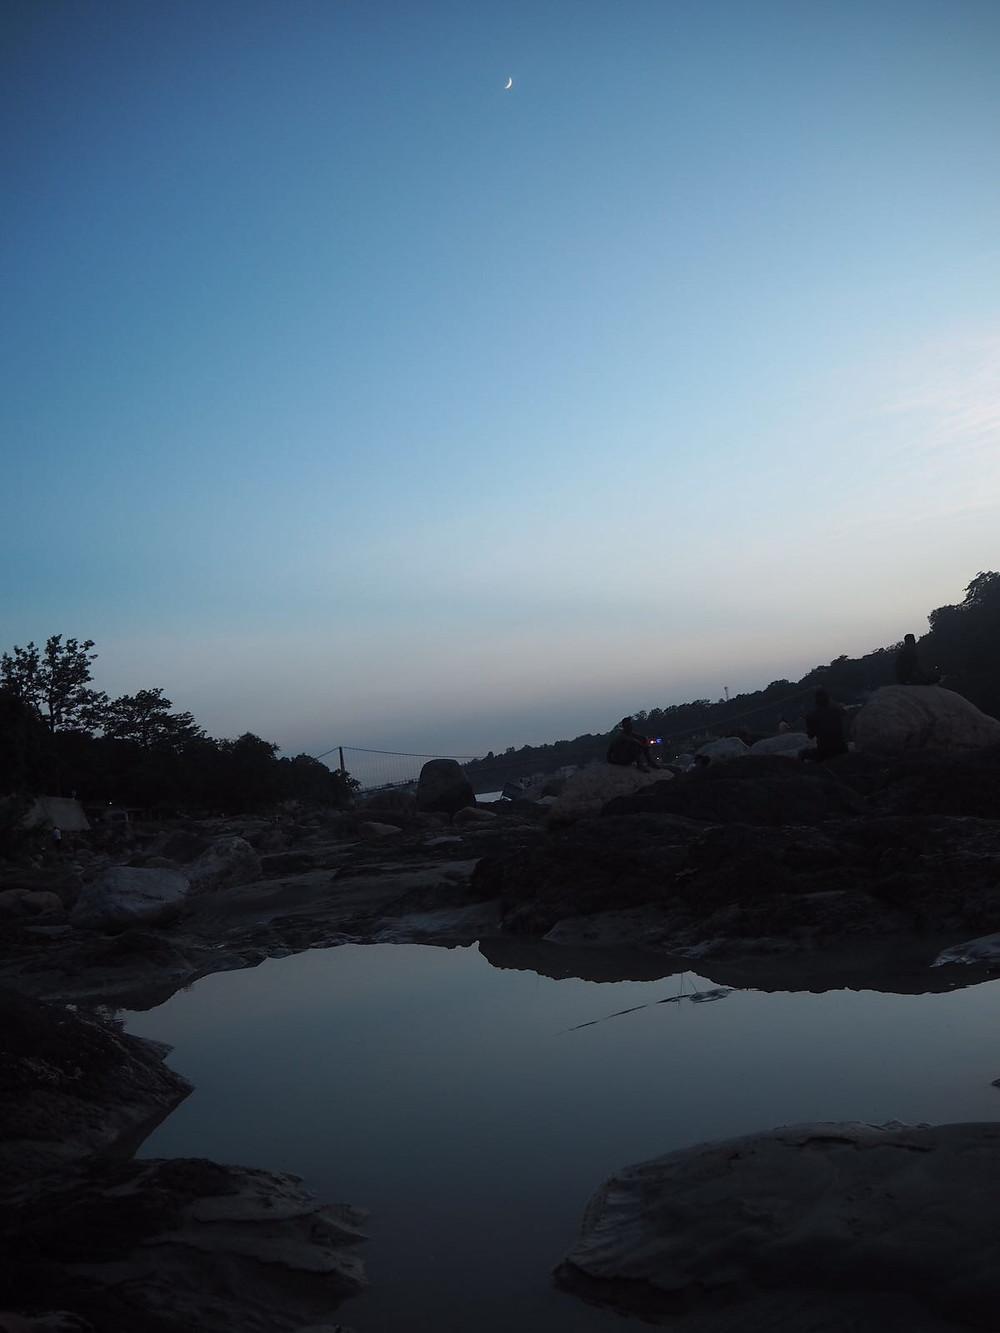 River Ganga - Rishikesh